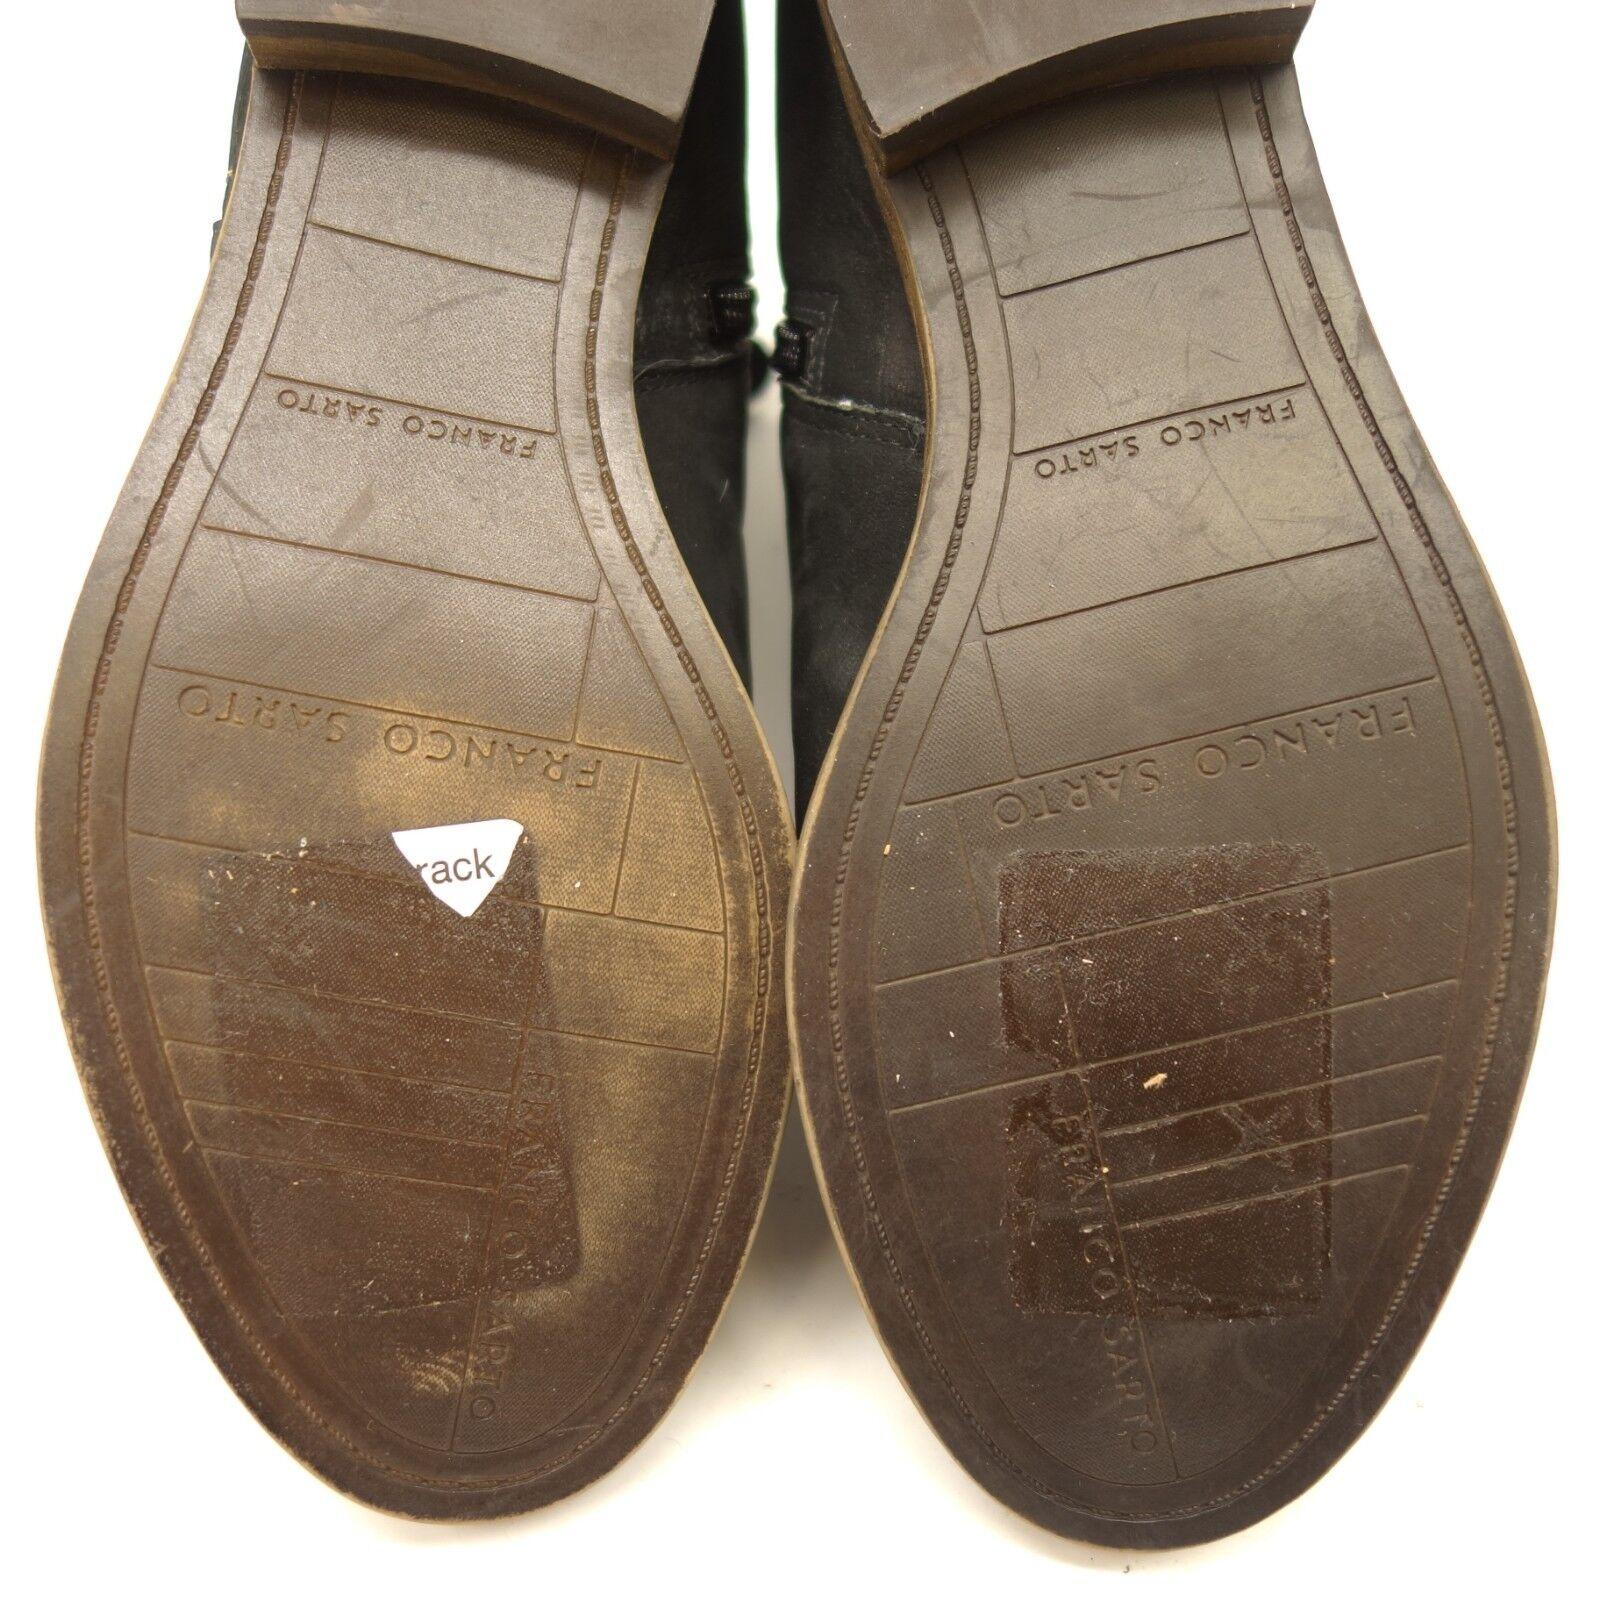 Nuevo Franco arenisca Sarto para mujer Kacey Negro arenisca Franco Gamuza al tobillo Botines botas Talla 8.5 e22de8